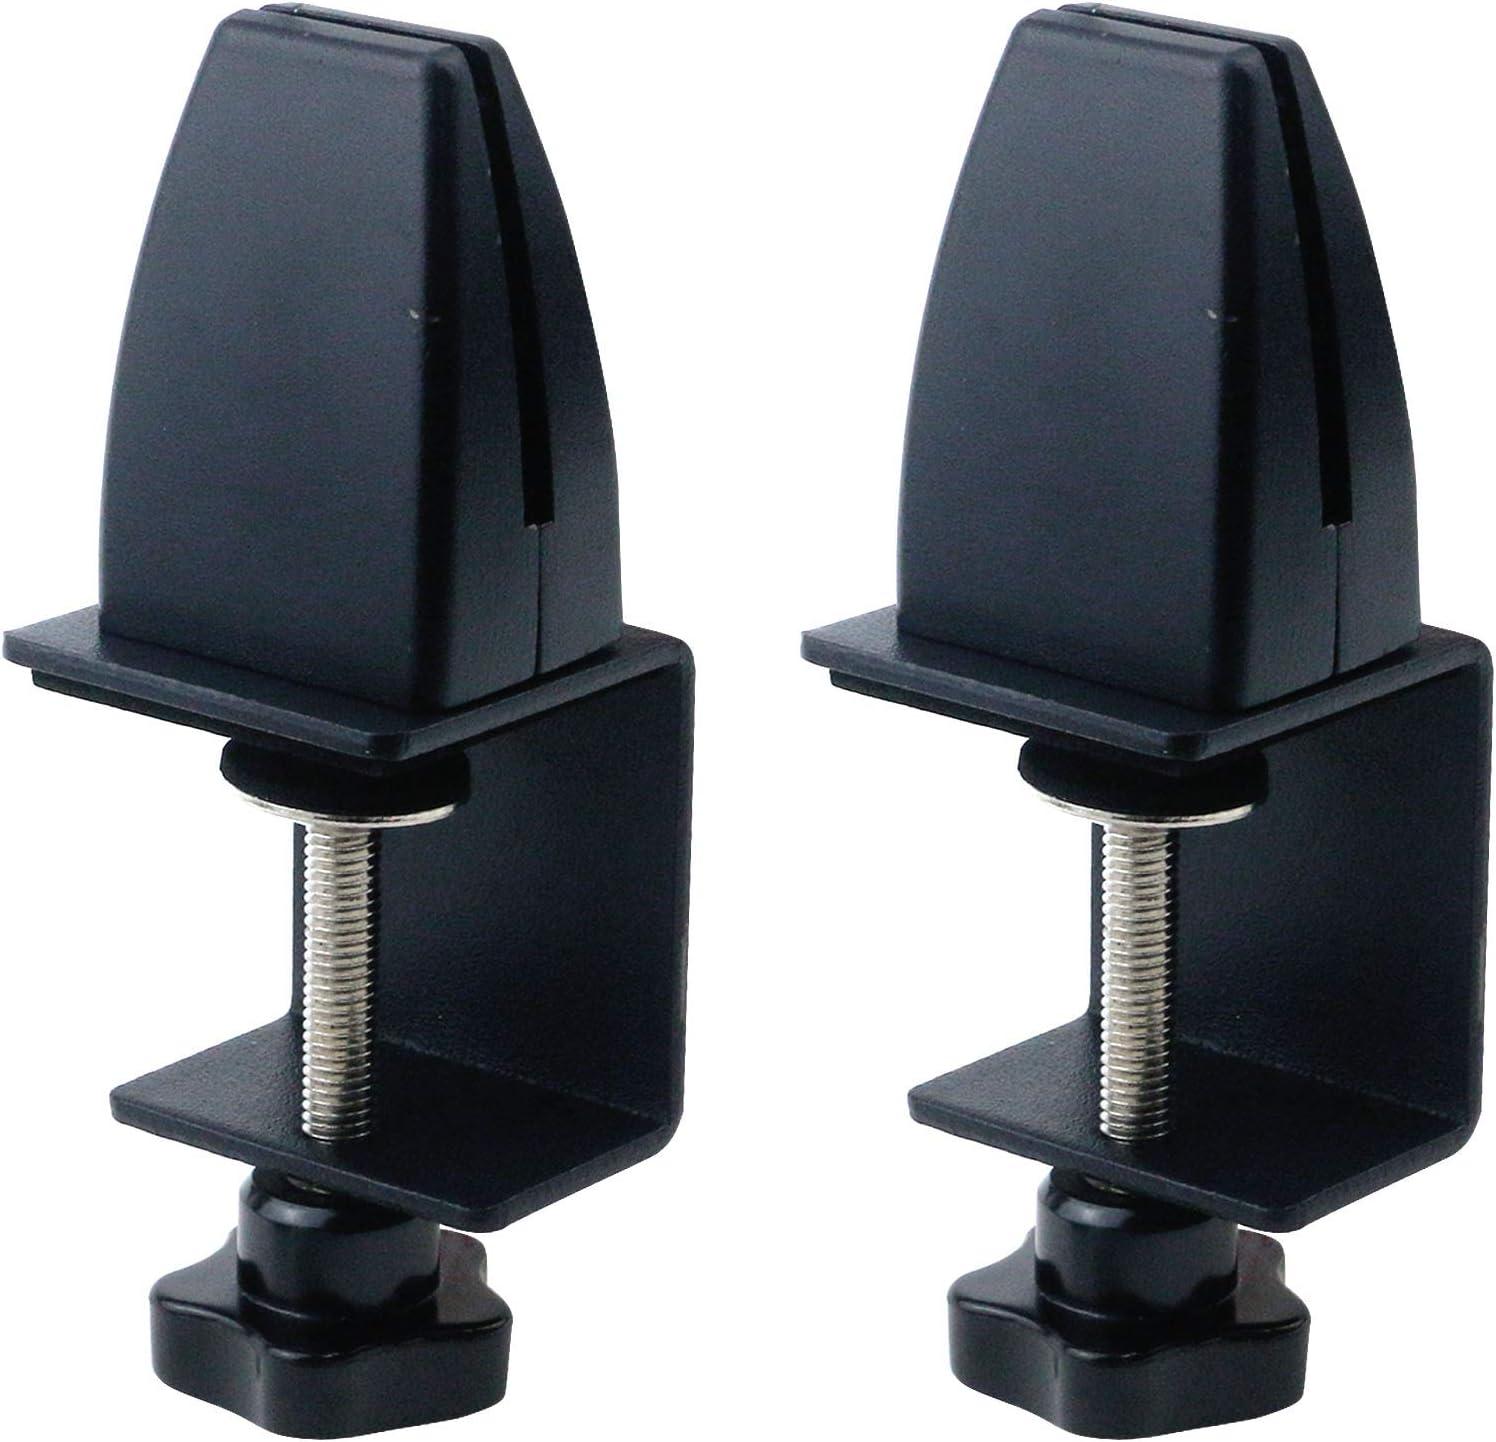 T Tulead 2Sets C-Shape supreme Partition Support Alloy Aluminum Bracket Max 81% OFF